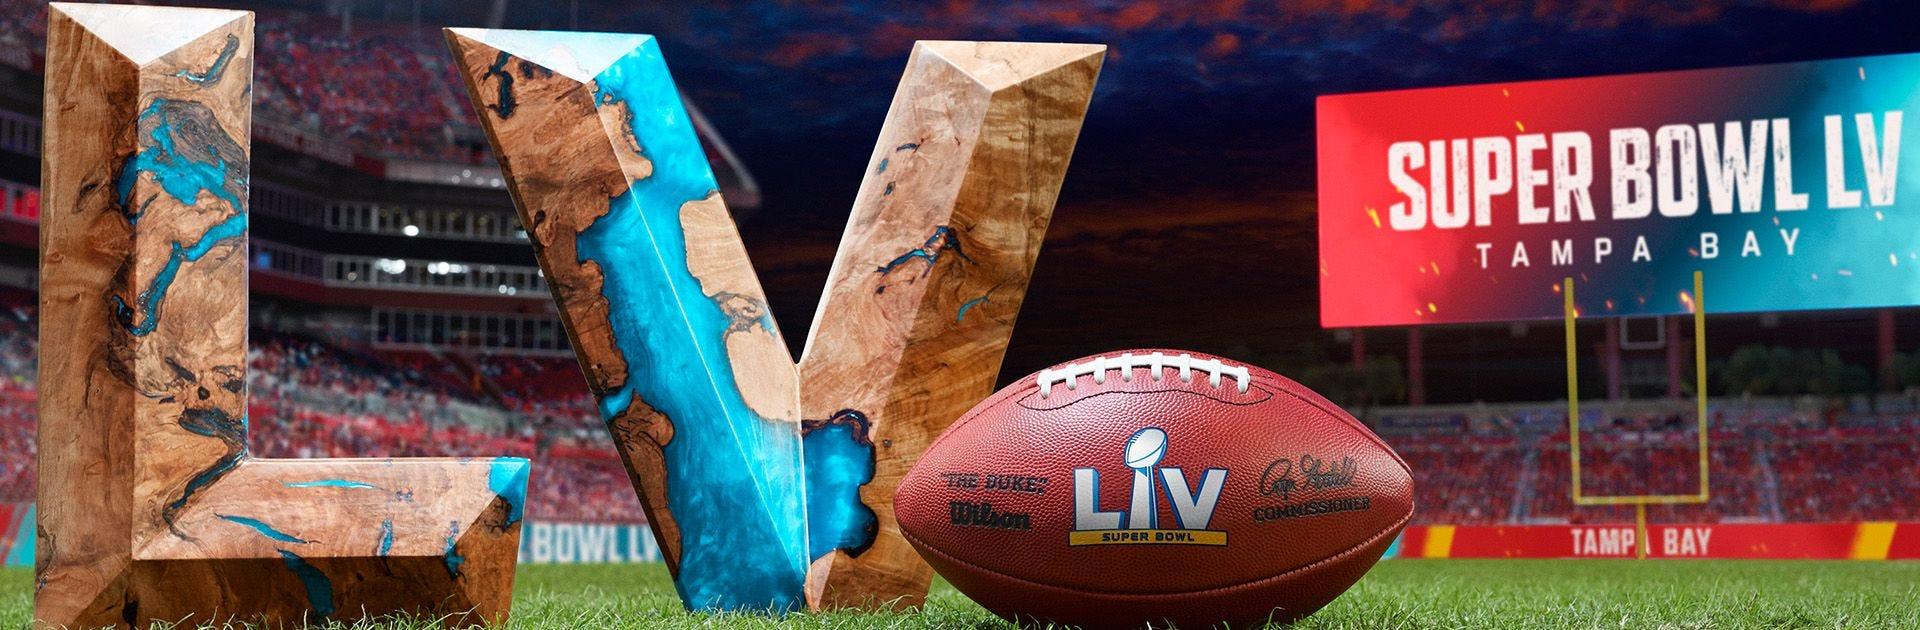 Super Bowl LV banner with a Wilson Duke football